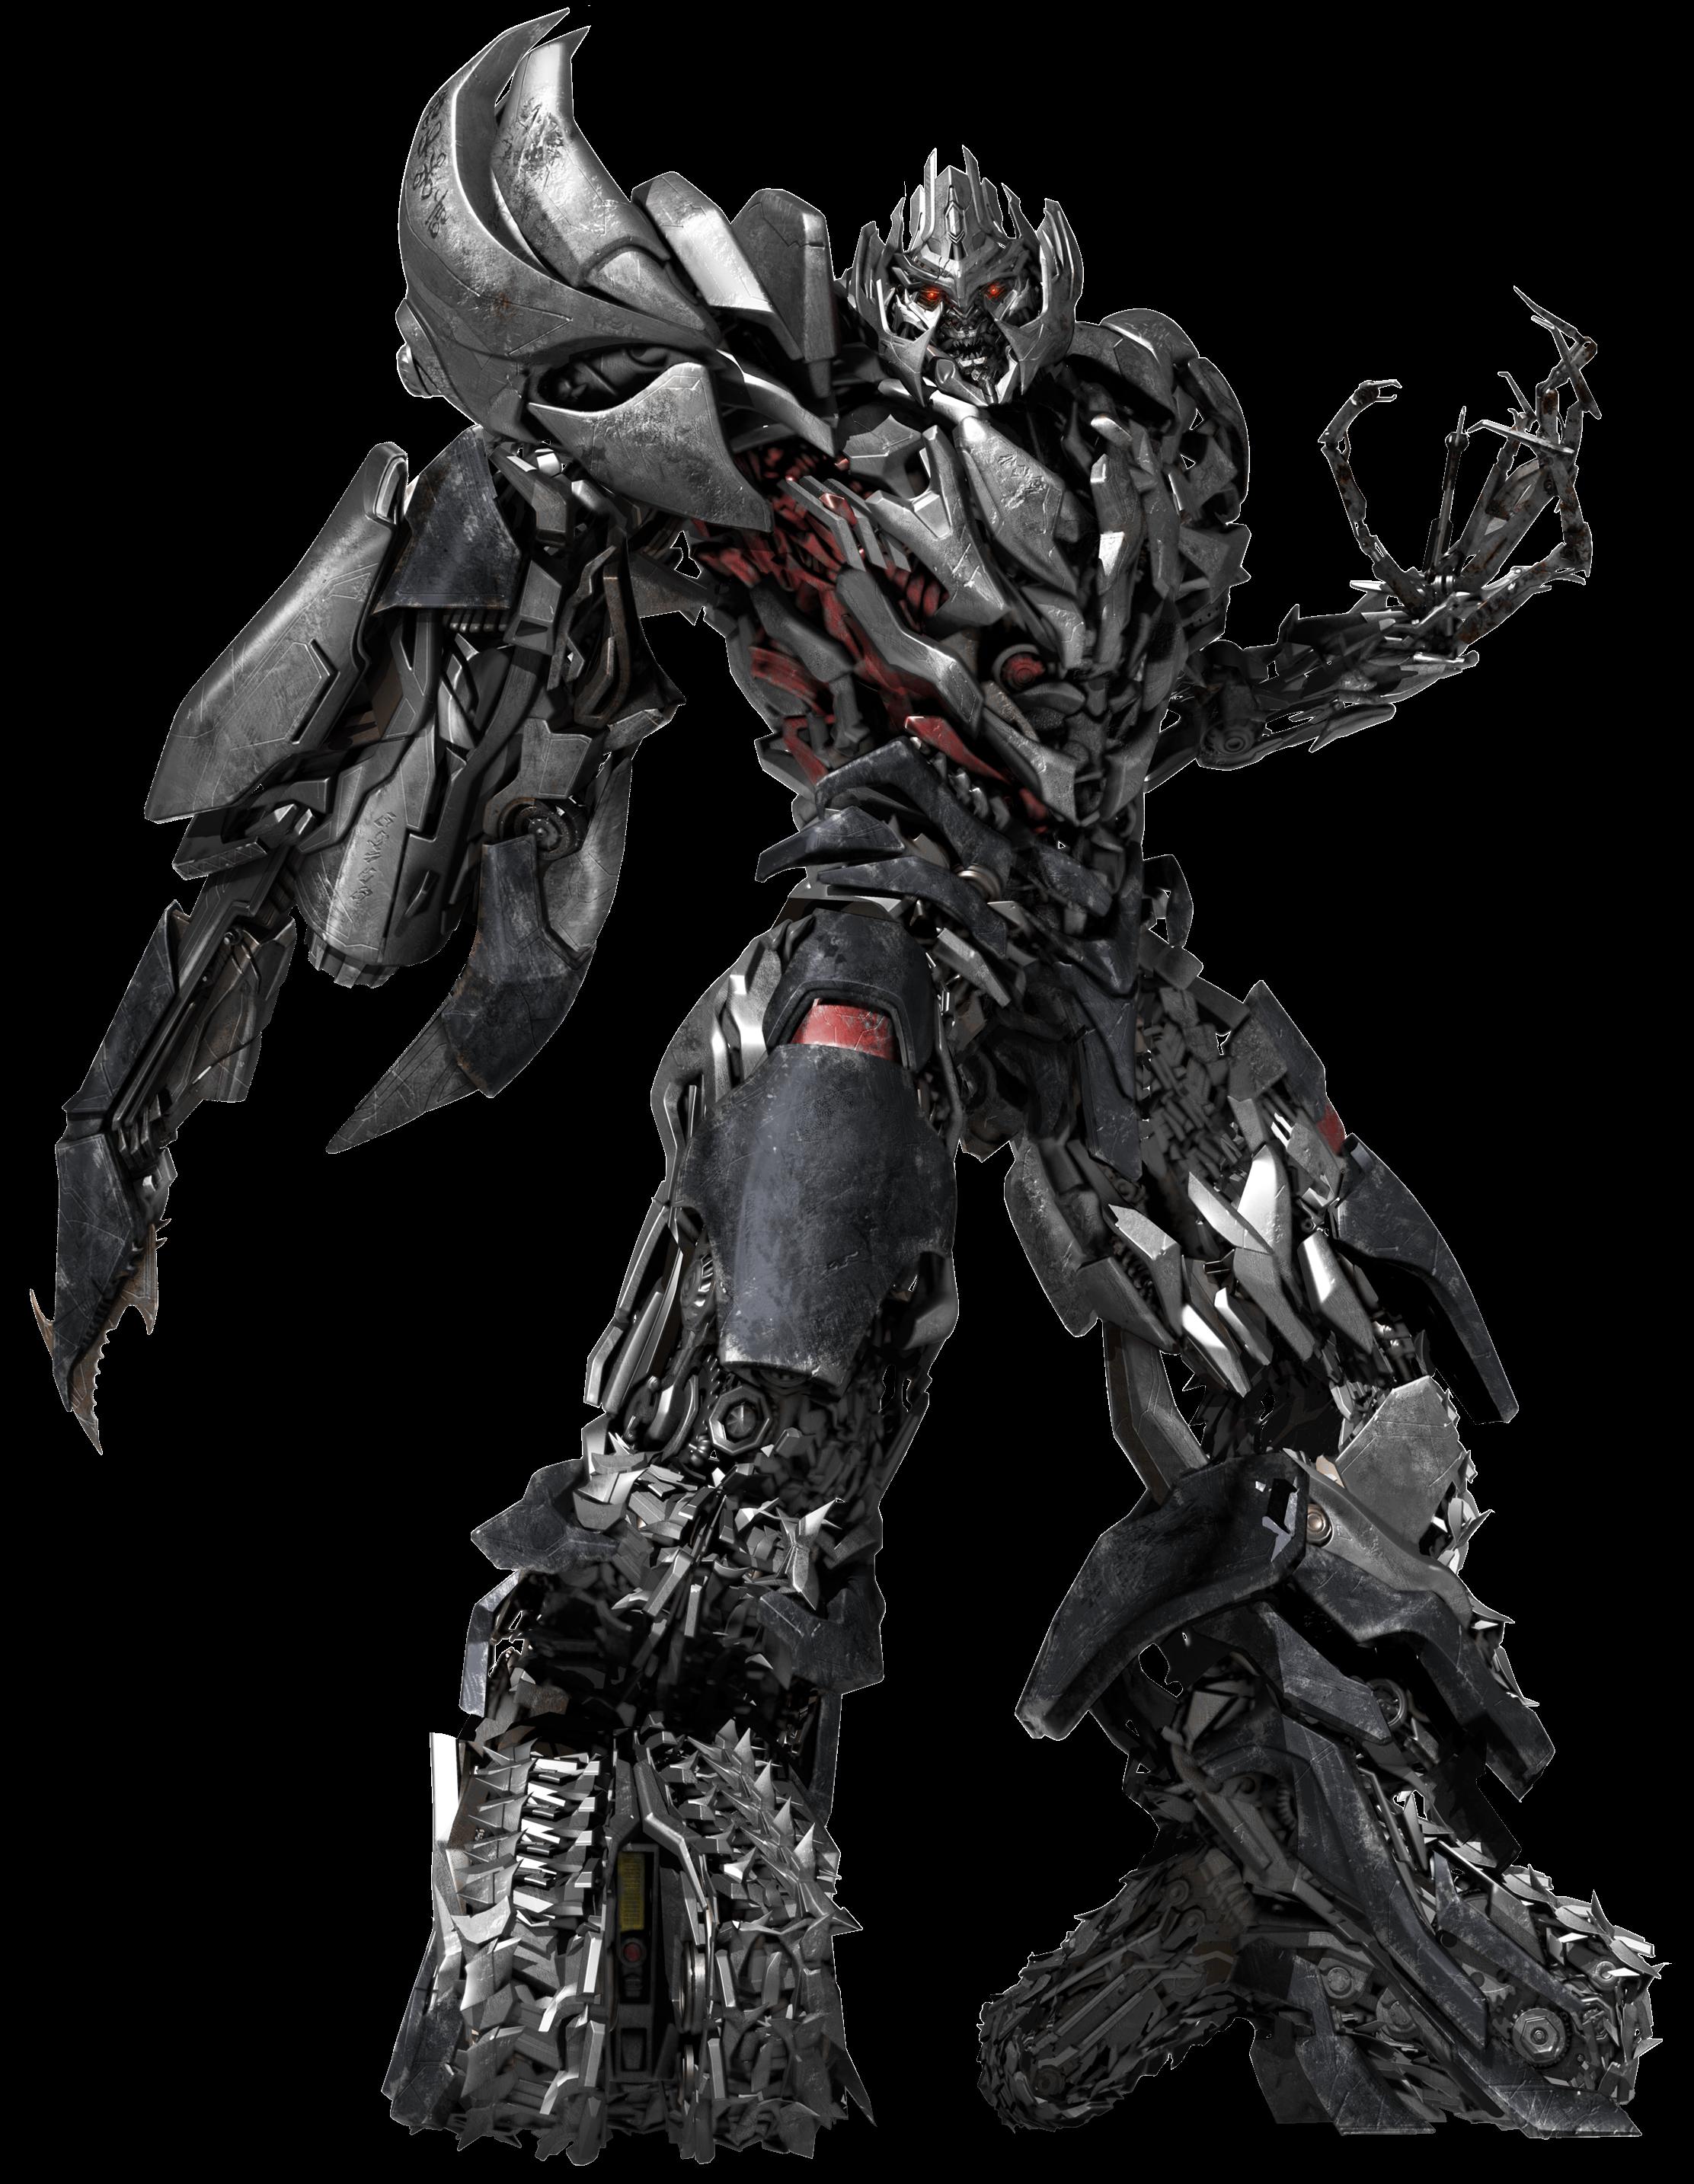 Megatron Rotf G1 Promo 1 By Barricade24 Megatron Artwork